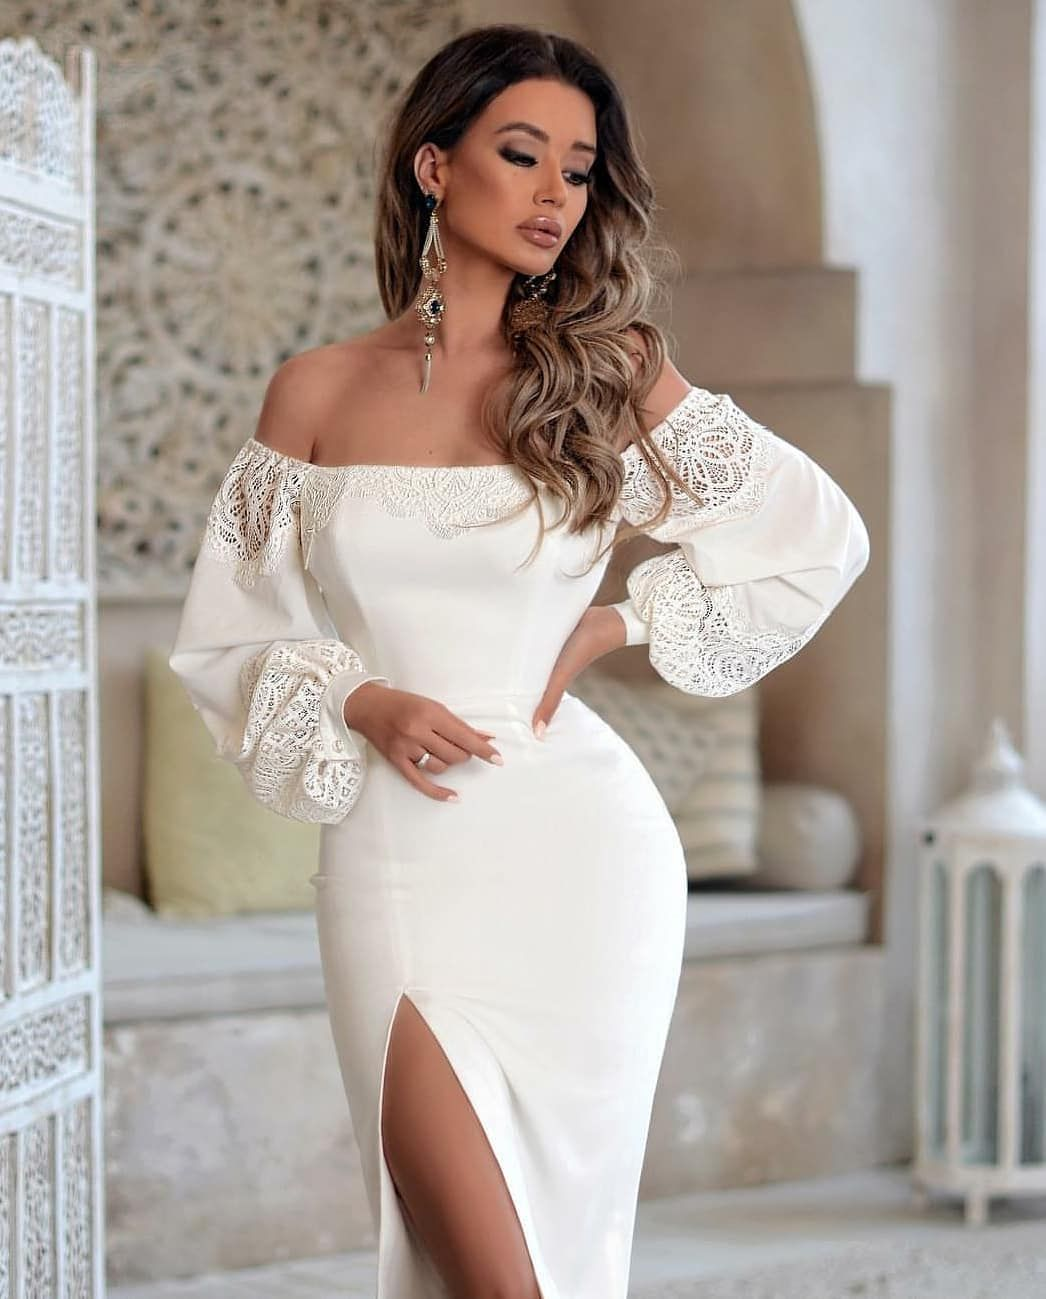 My World Of Dresses On Instagram Beyond Gorgeous 1 10 Choose Your Favorite Rita Tesla Lifestyle Luxury Fas In 2020 Fashion Dresses Fashion Dresses